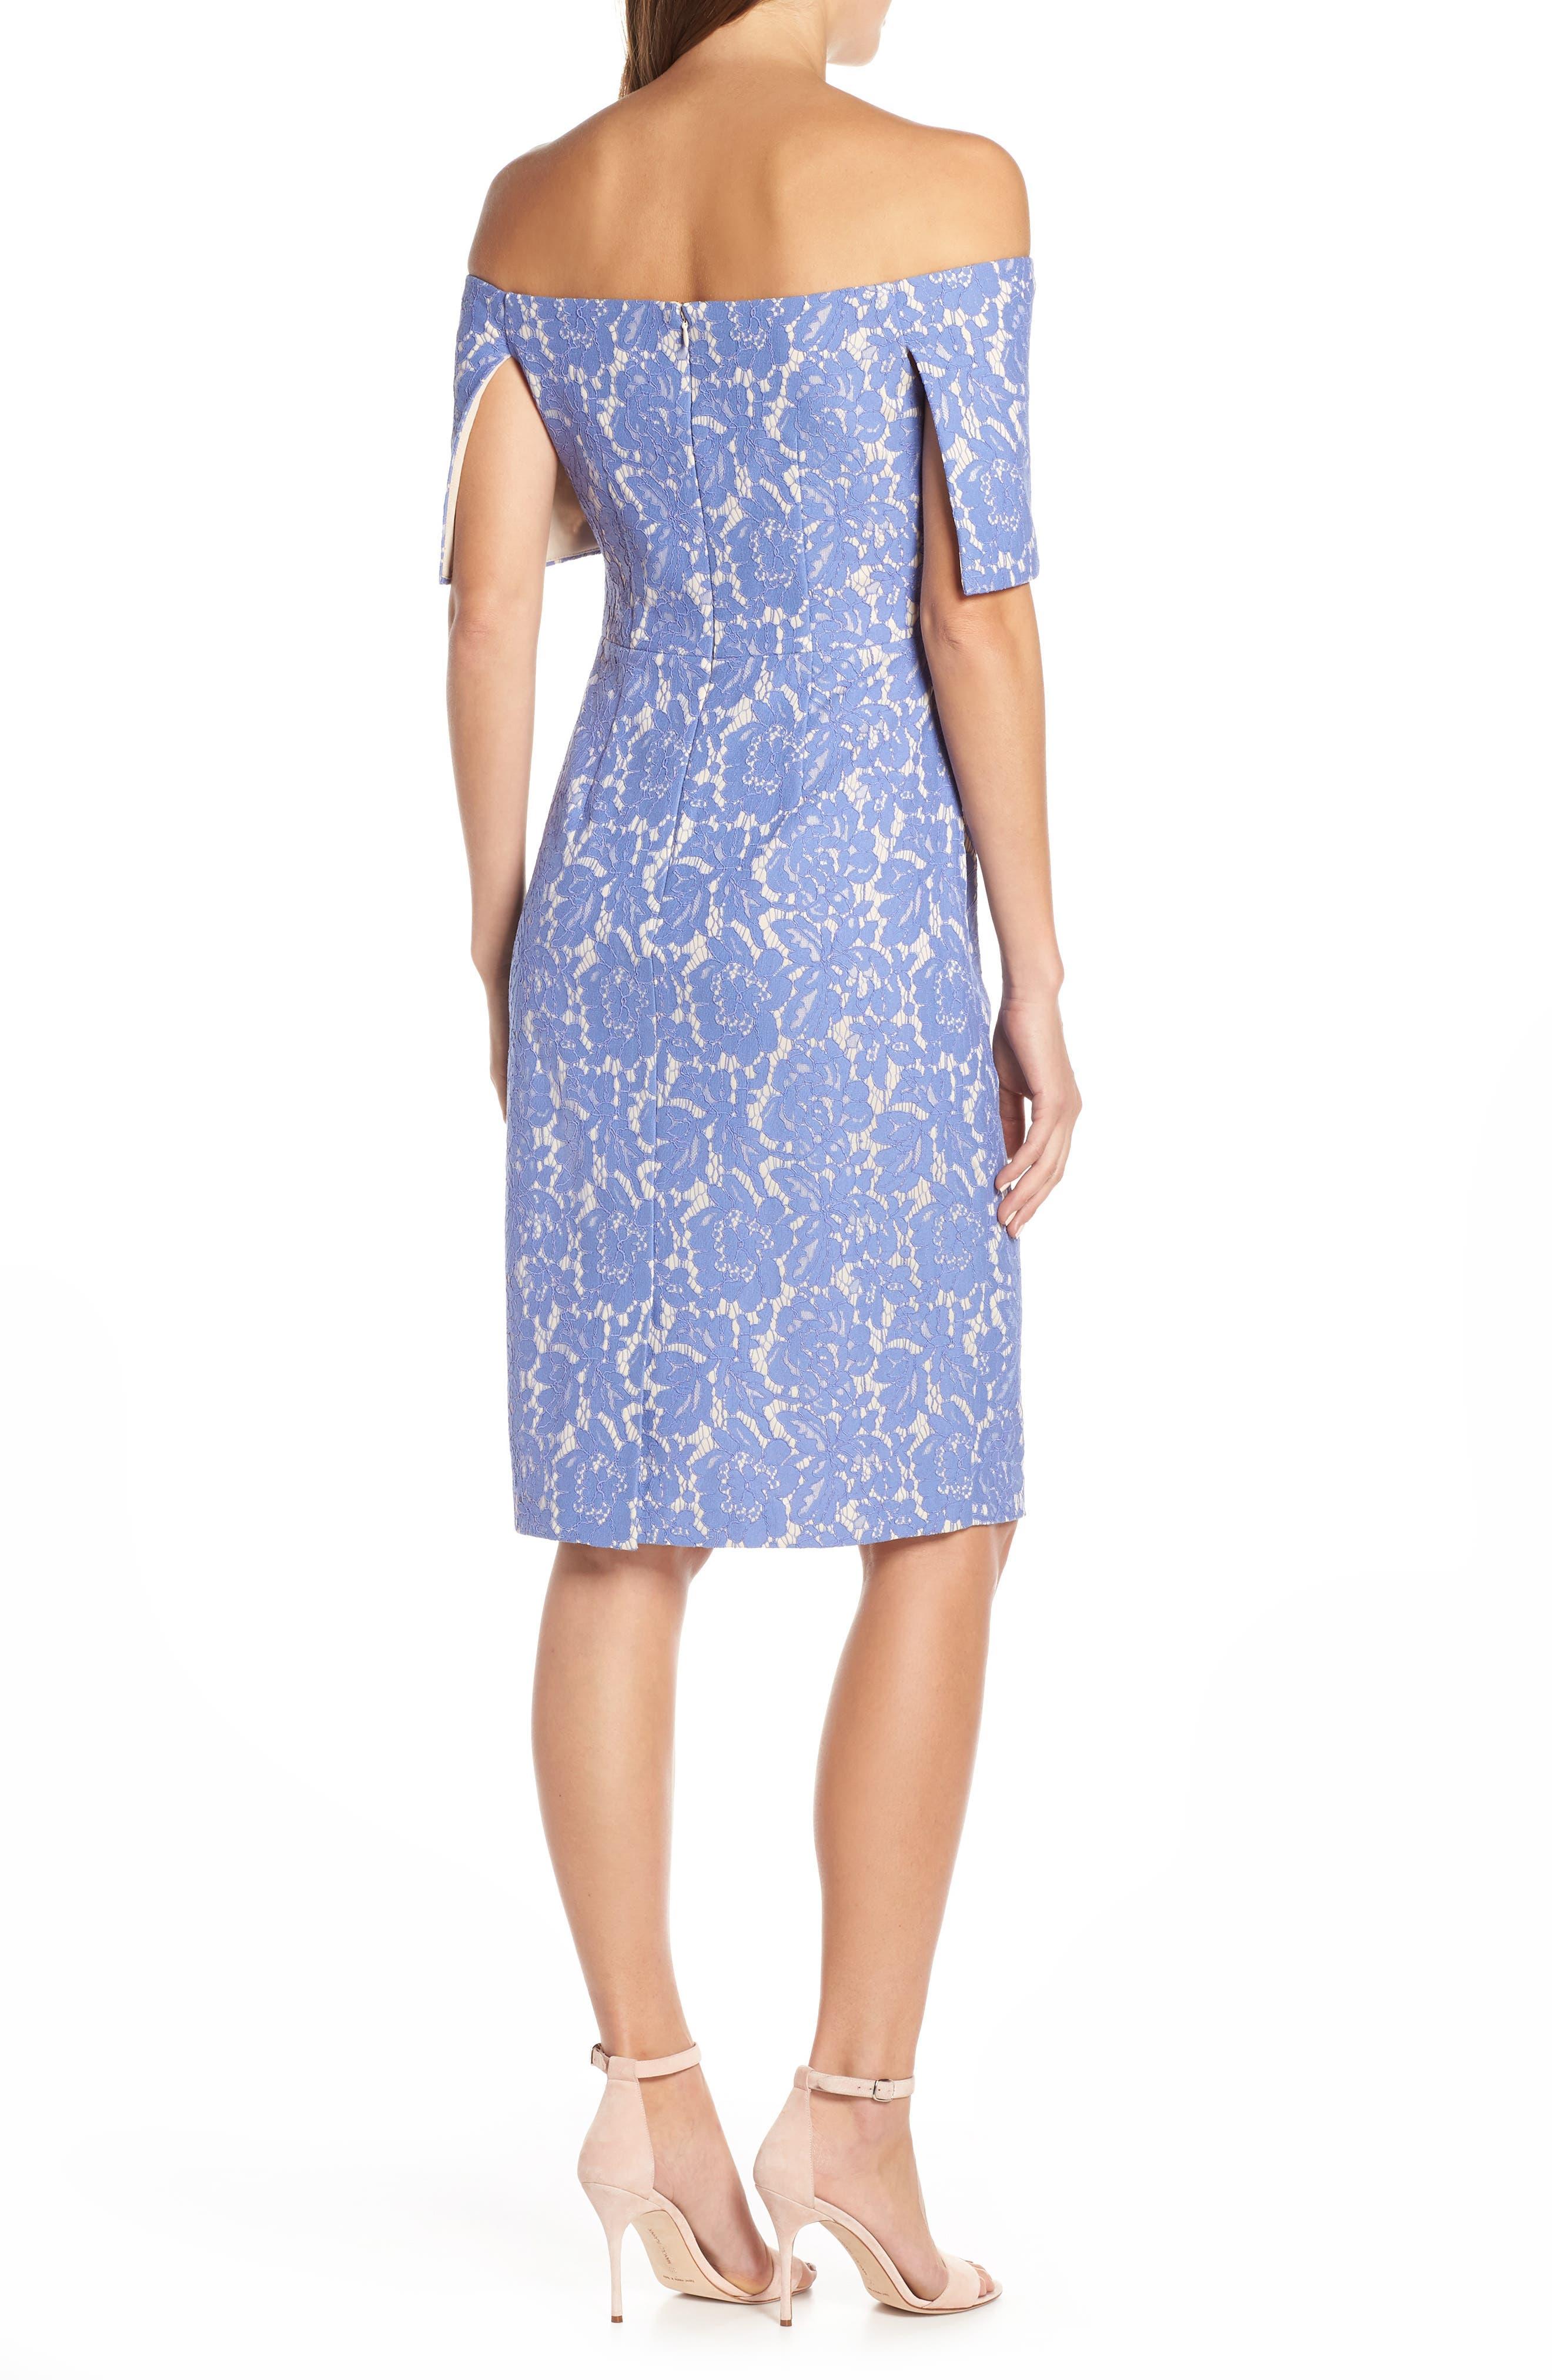 VINCE CAMUTO,                             Off the Shoulder Lace Sheath Dress,                             Alternate thumbnail 2, color,                             PERIWINKLE